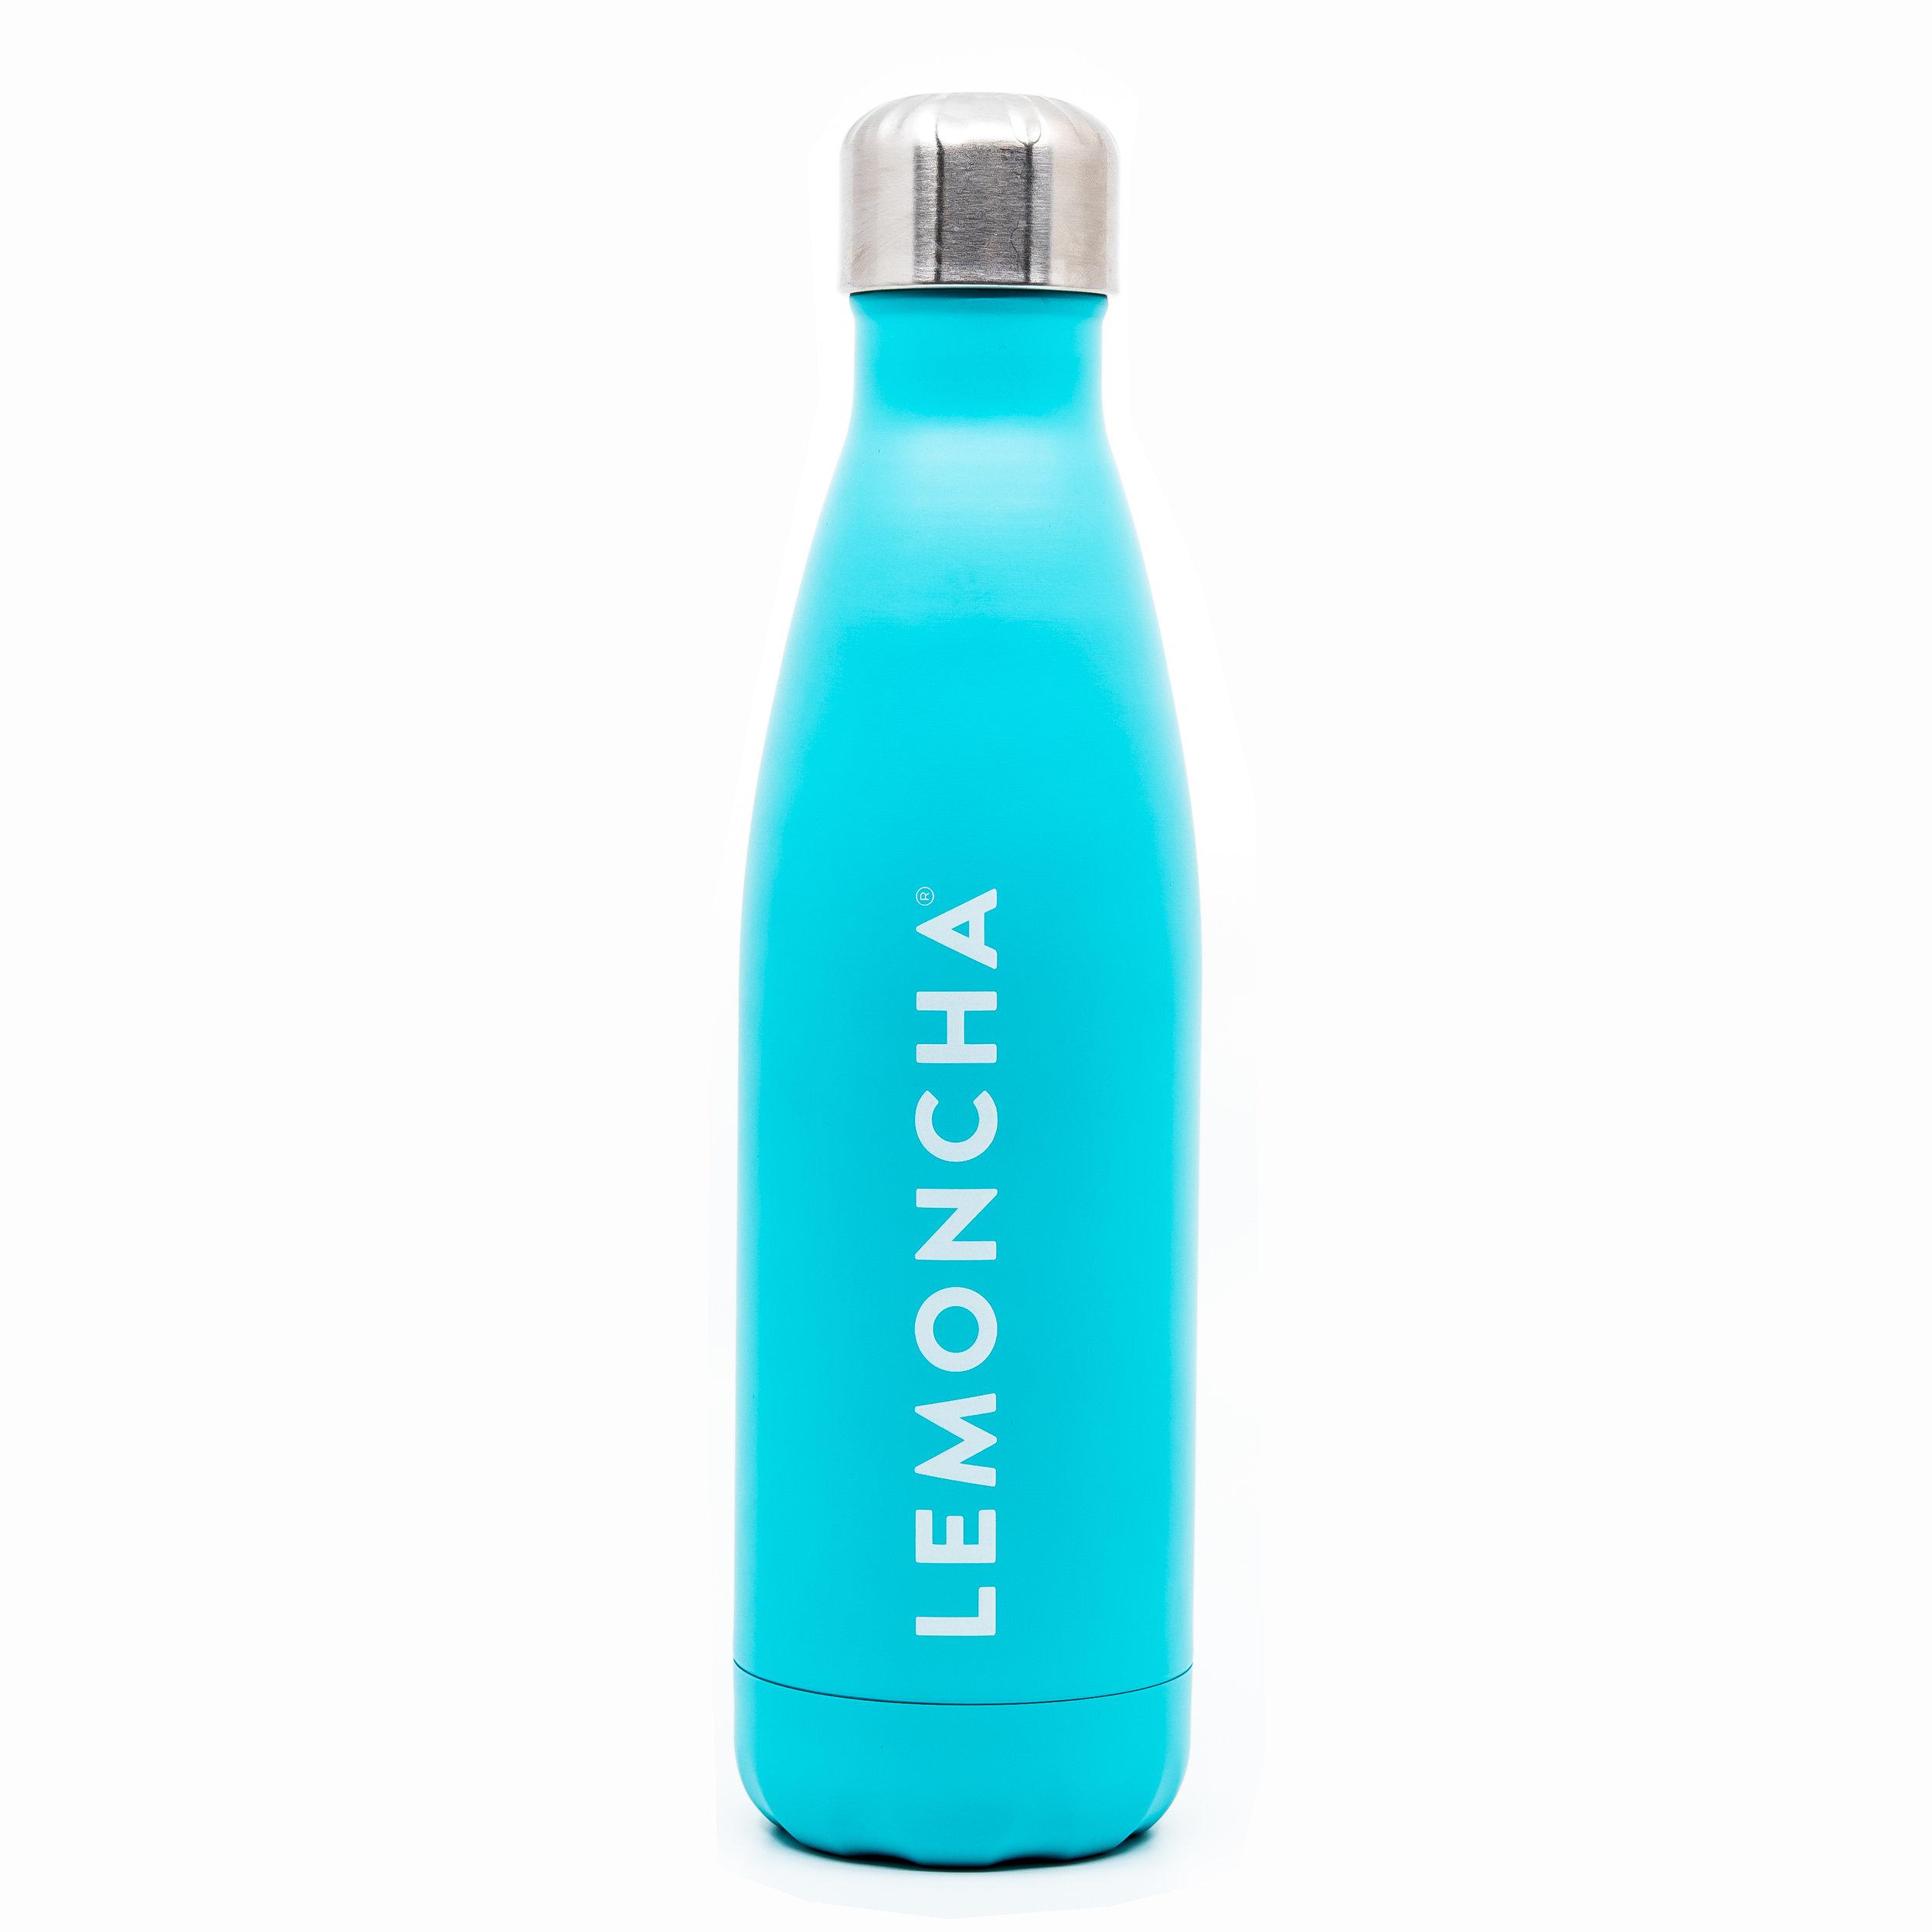 Lemoncha Lagoon Bottle Limited Edition